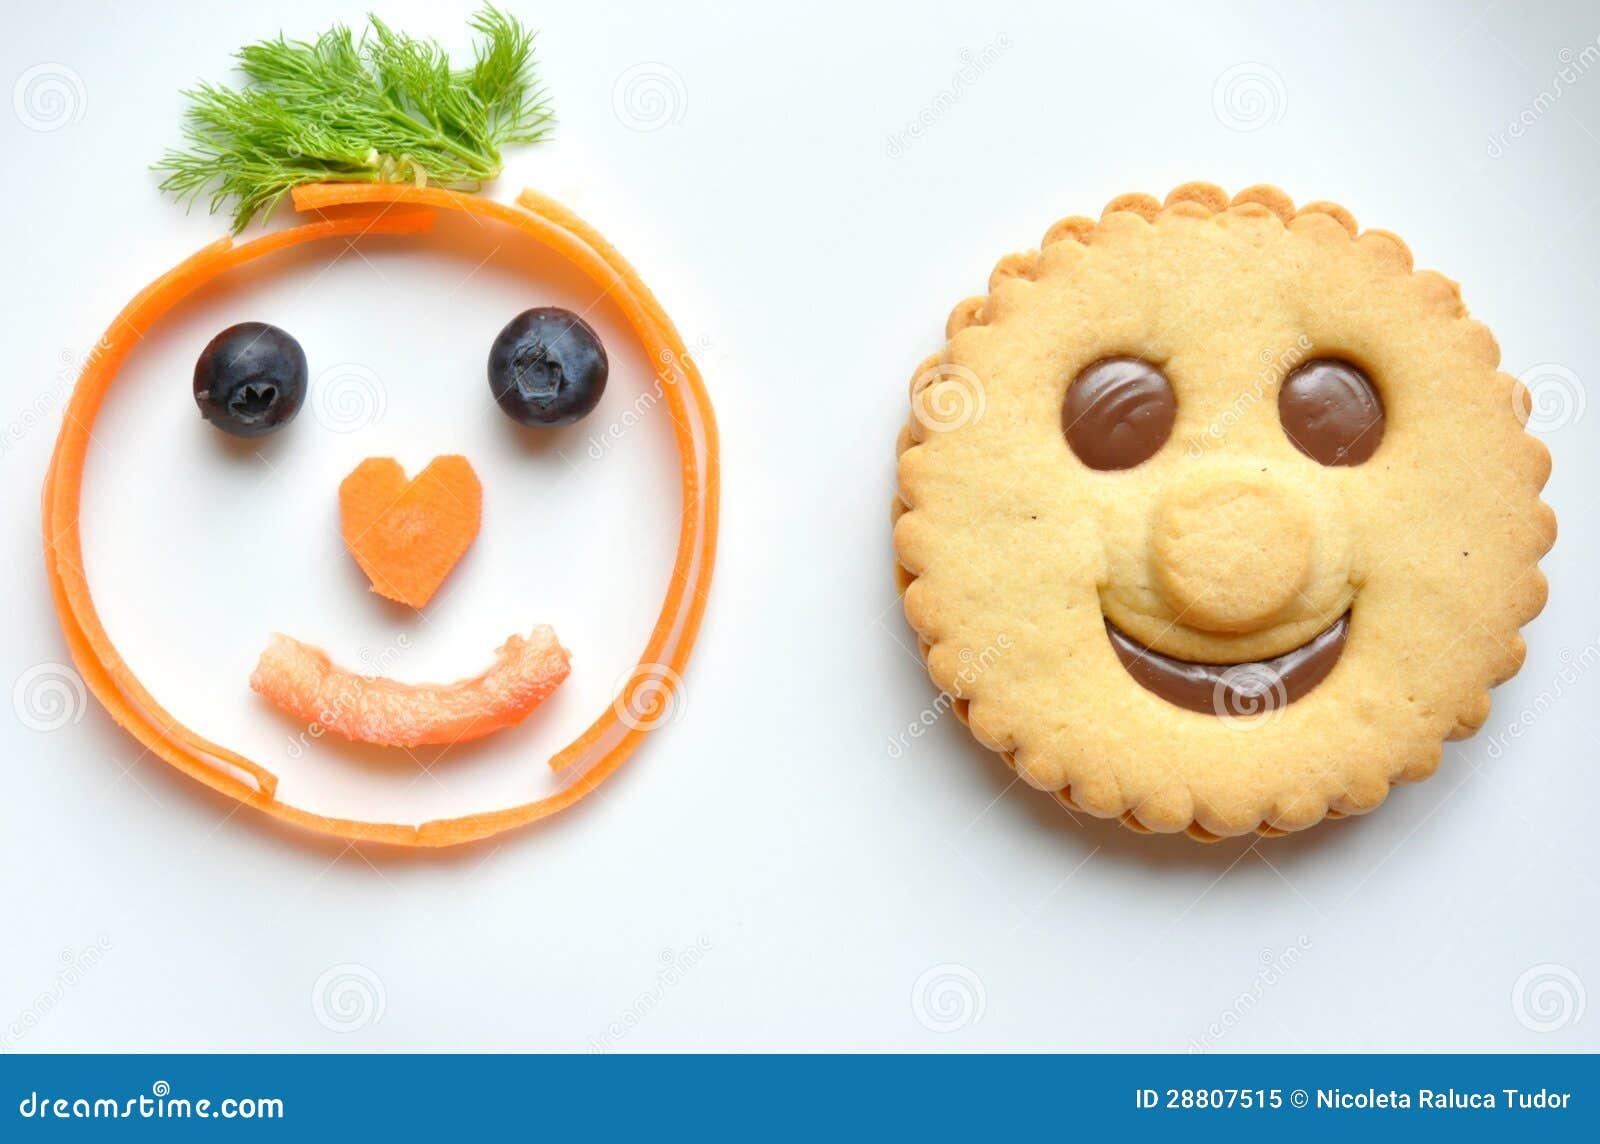 Healthy Unhealthy Food Flashcards